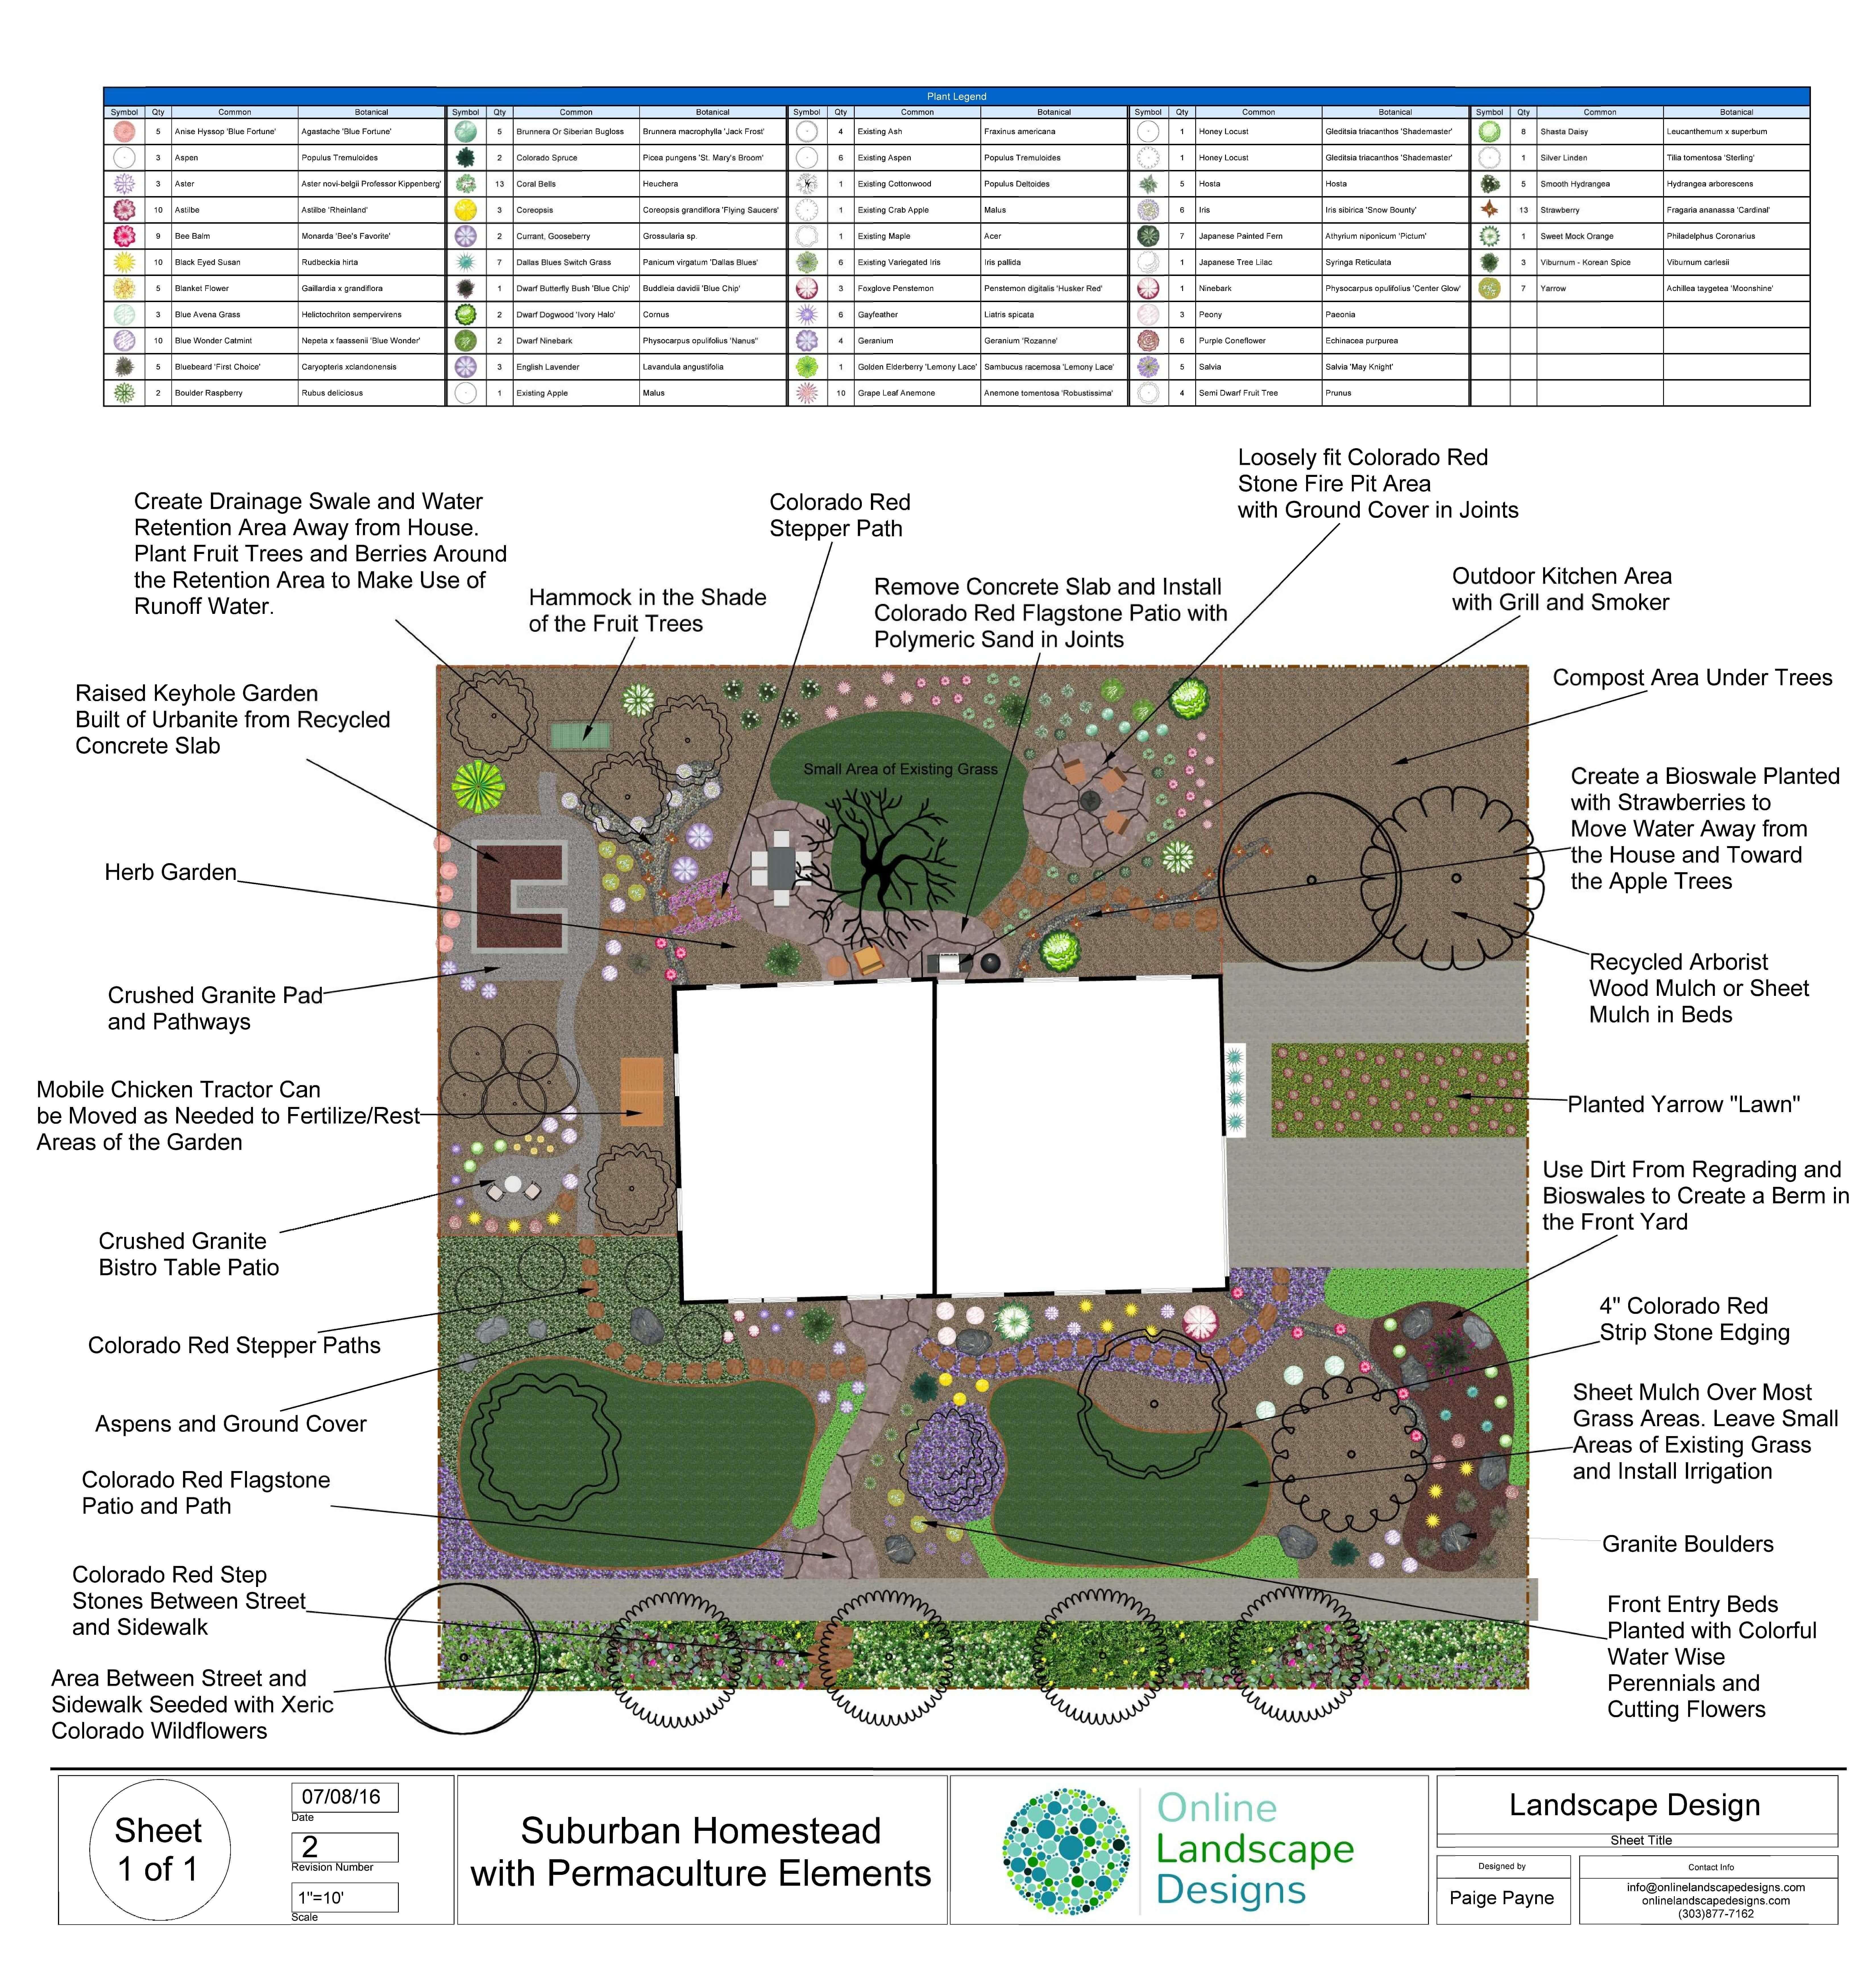 Permaculture Landscape Design Created By Online Landscape Designs Online Landscape Design Landscape Design Garden Design Images